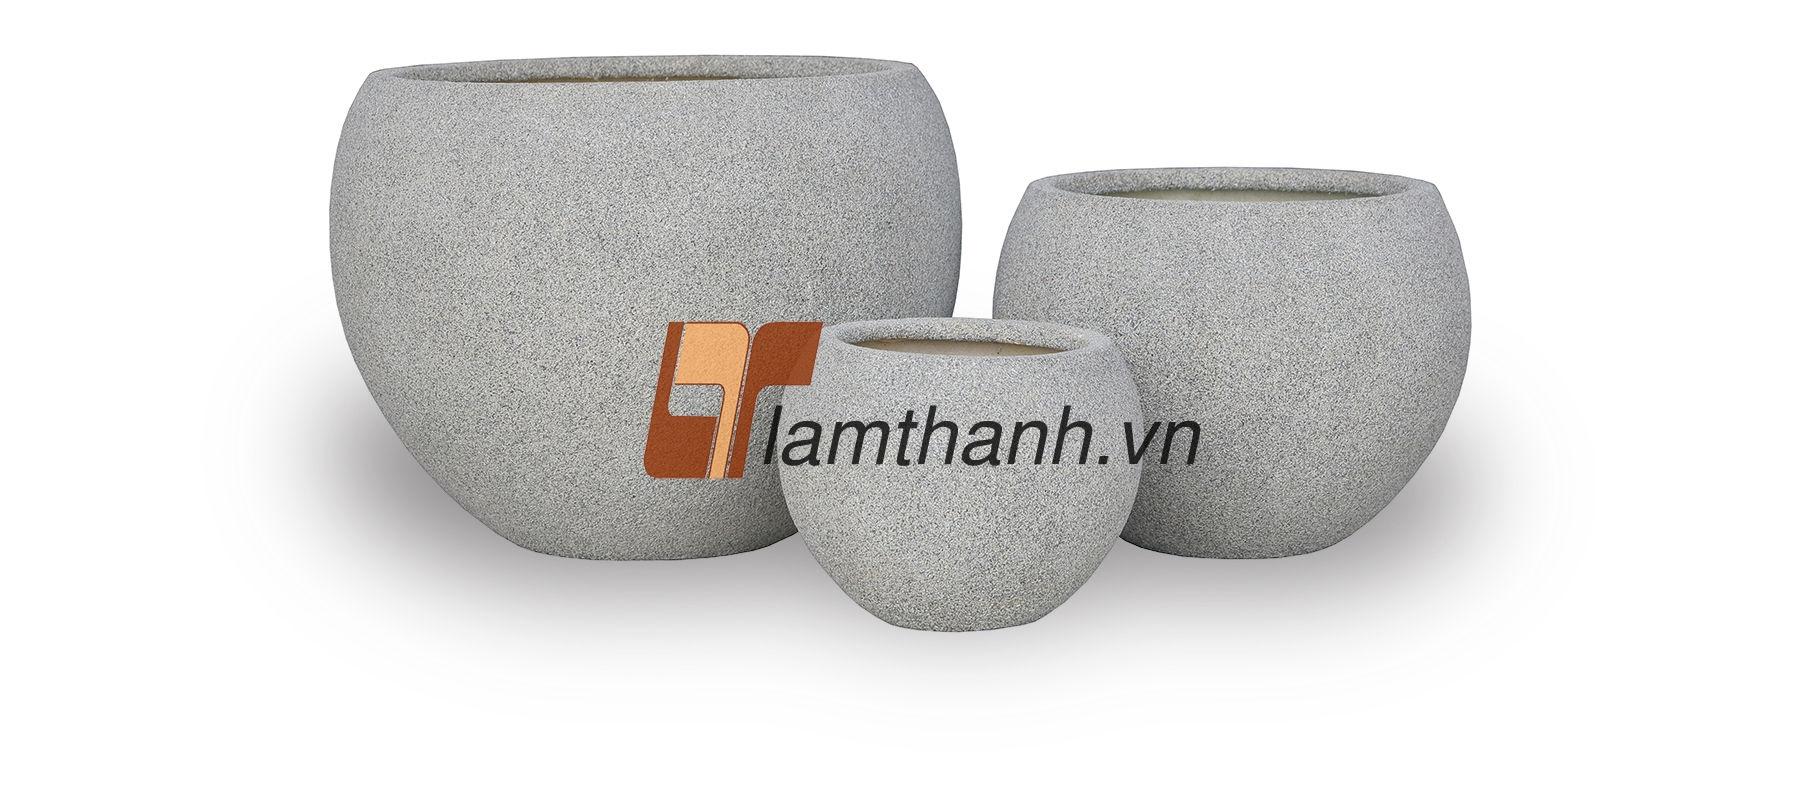 vietnam polystone, fiberglass 01